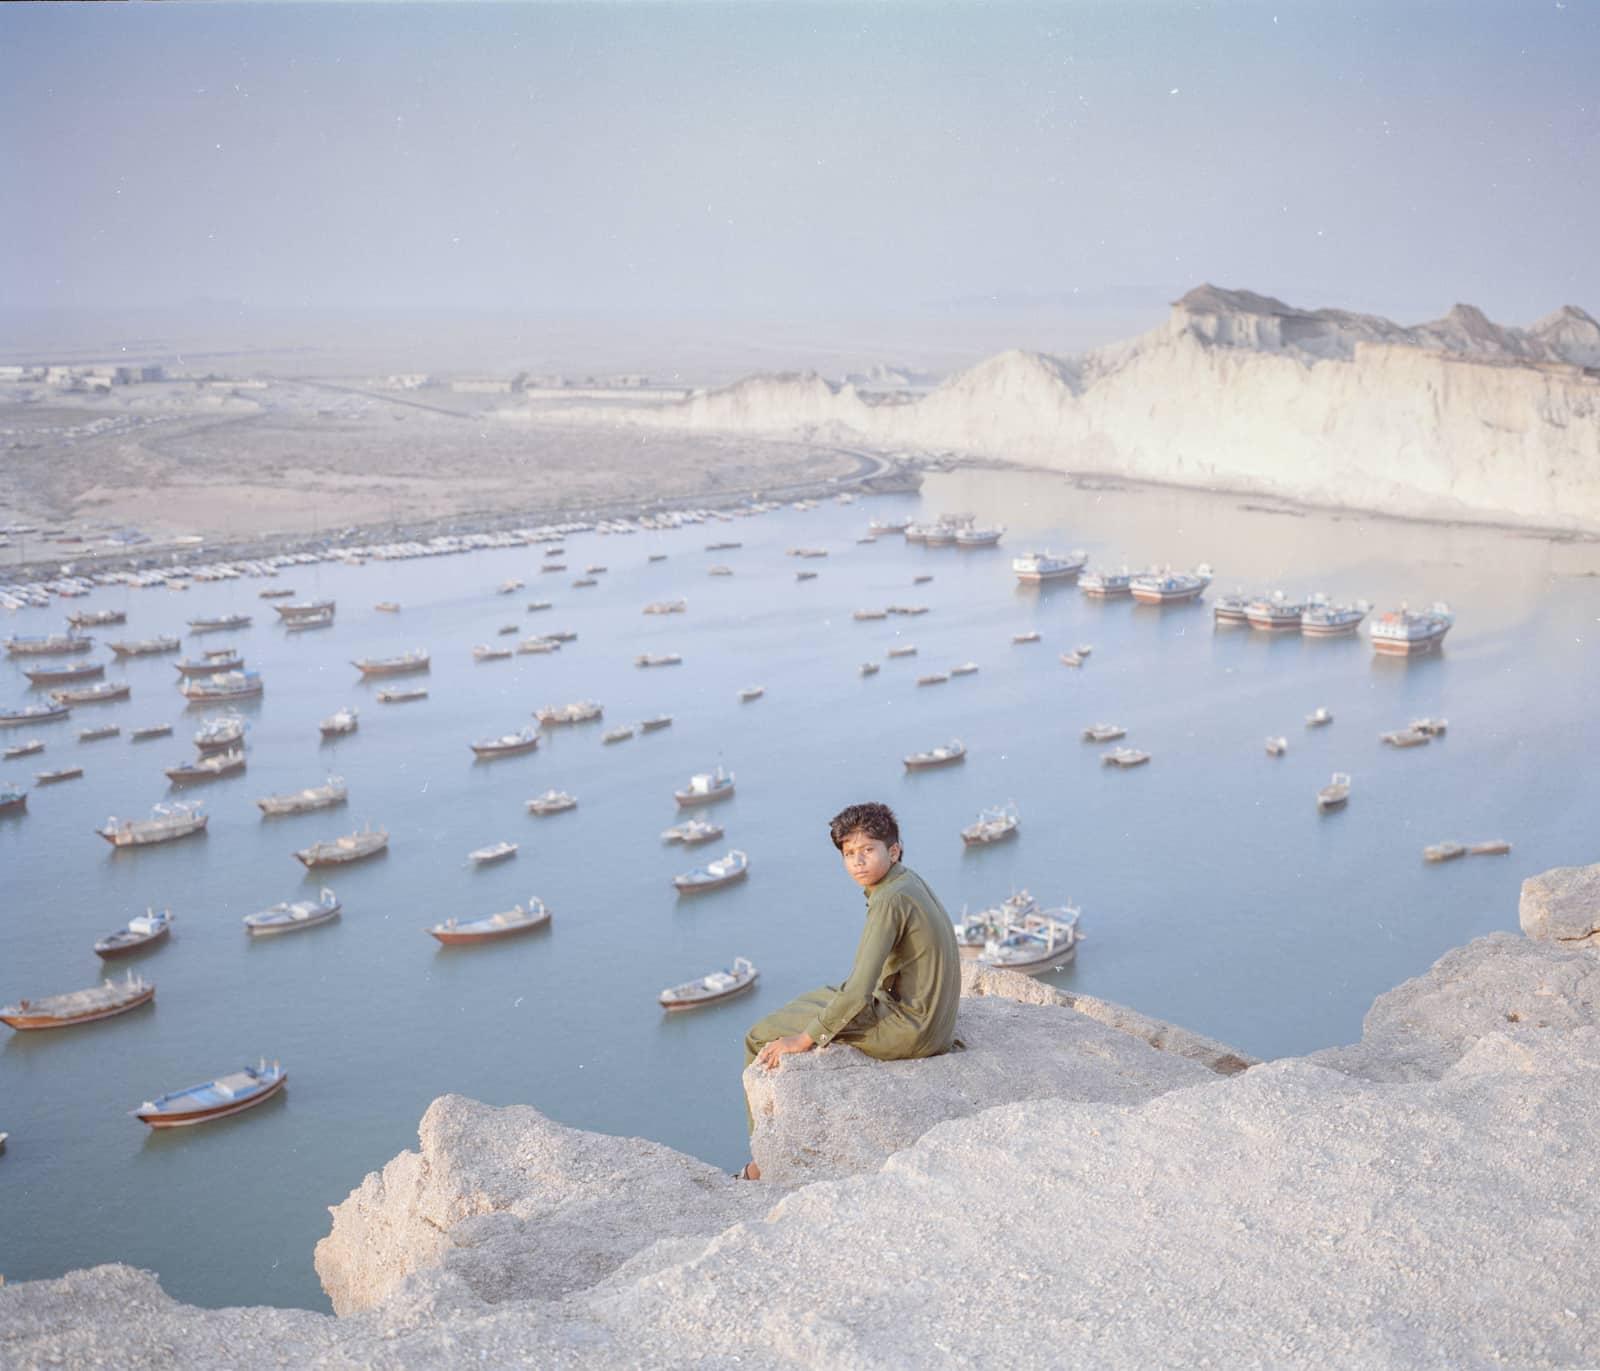 foto: © Hashem Shakeri, Iran, Professional Documentary, 2019